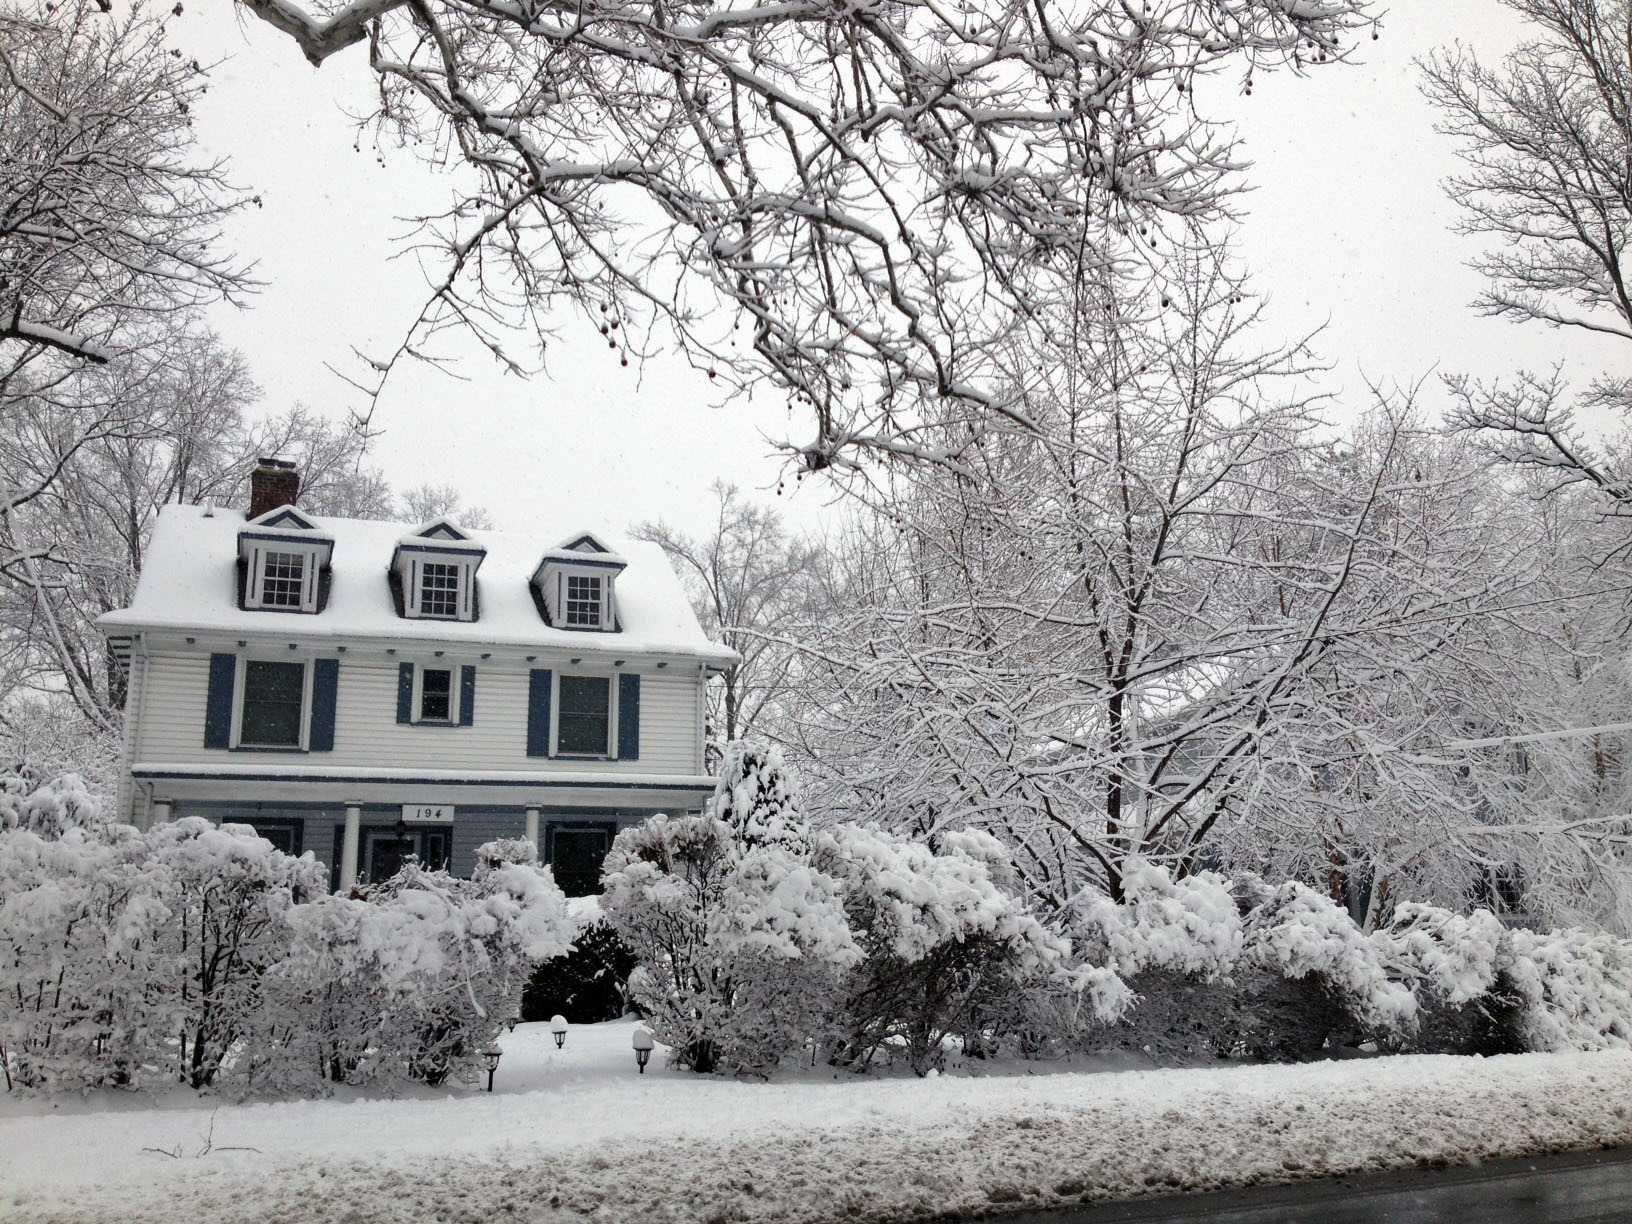 5e8bd486fe44de4cc7e8_Snow_House.jpg